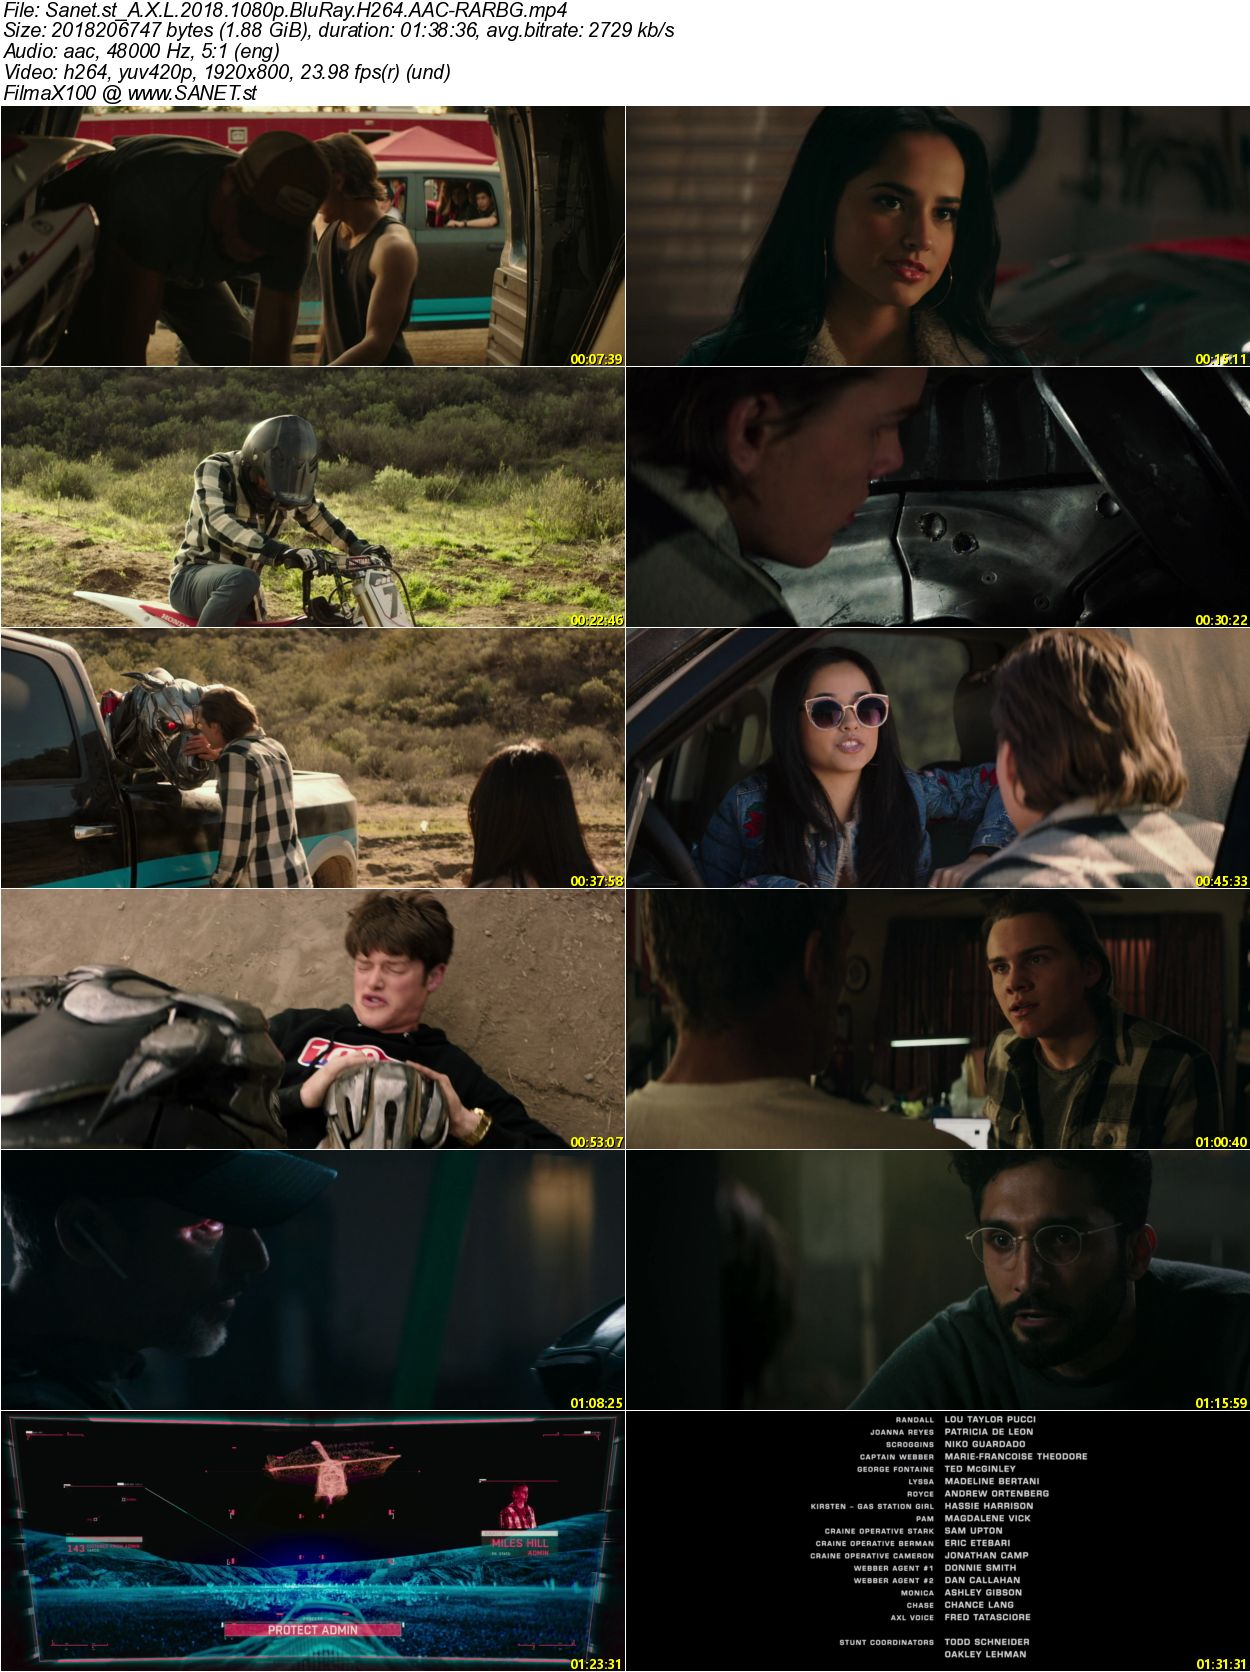 Axl Movie 2018 download a.x.l 2018 1080p bluray h264 aac-rarbg - softarchive